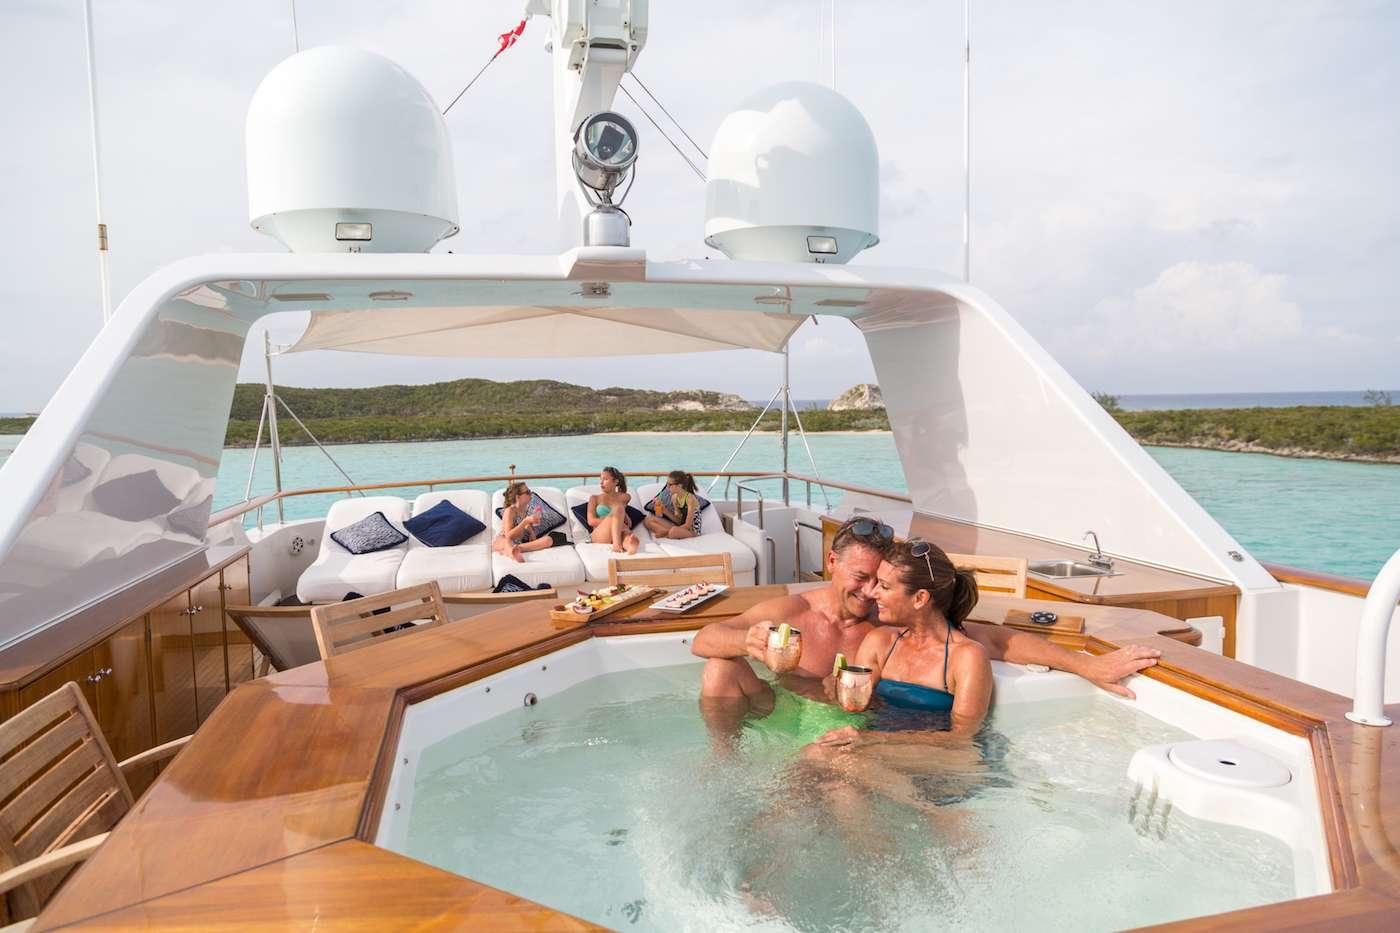 Motor Yacht 'LADY J' Sun Deck, 12 PAX, 9 Crew, 142.00 Ft, 43.00 Meters, Built 1997, Palmer Johnson, Refit Year 2017